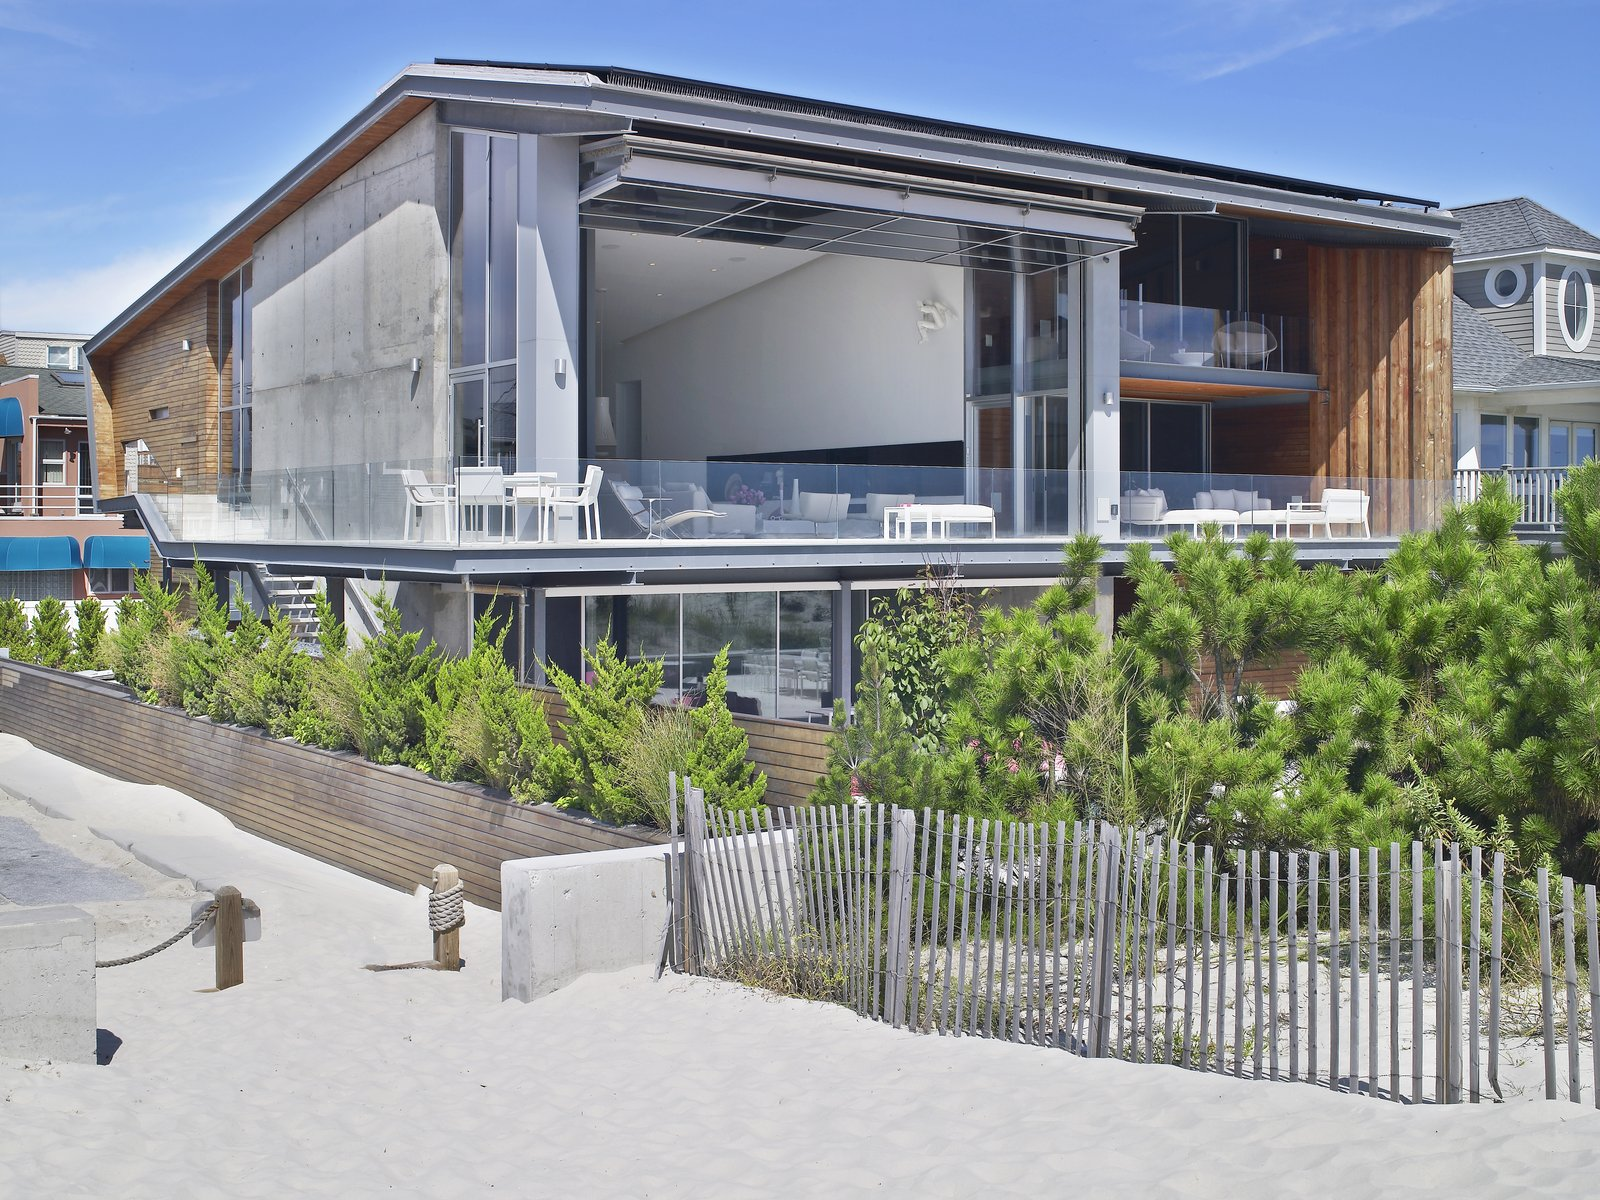 Beach House on Long Island hangar door